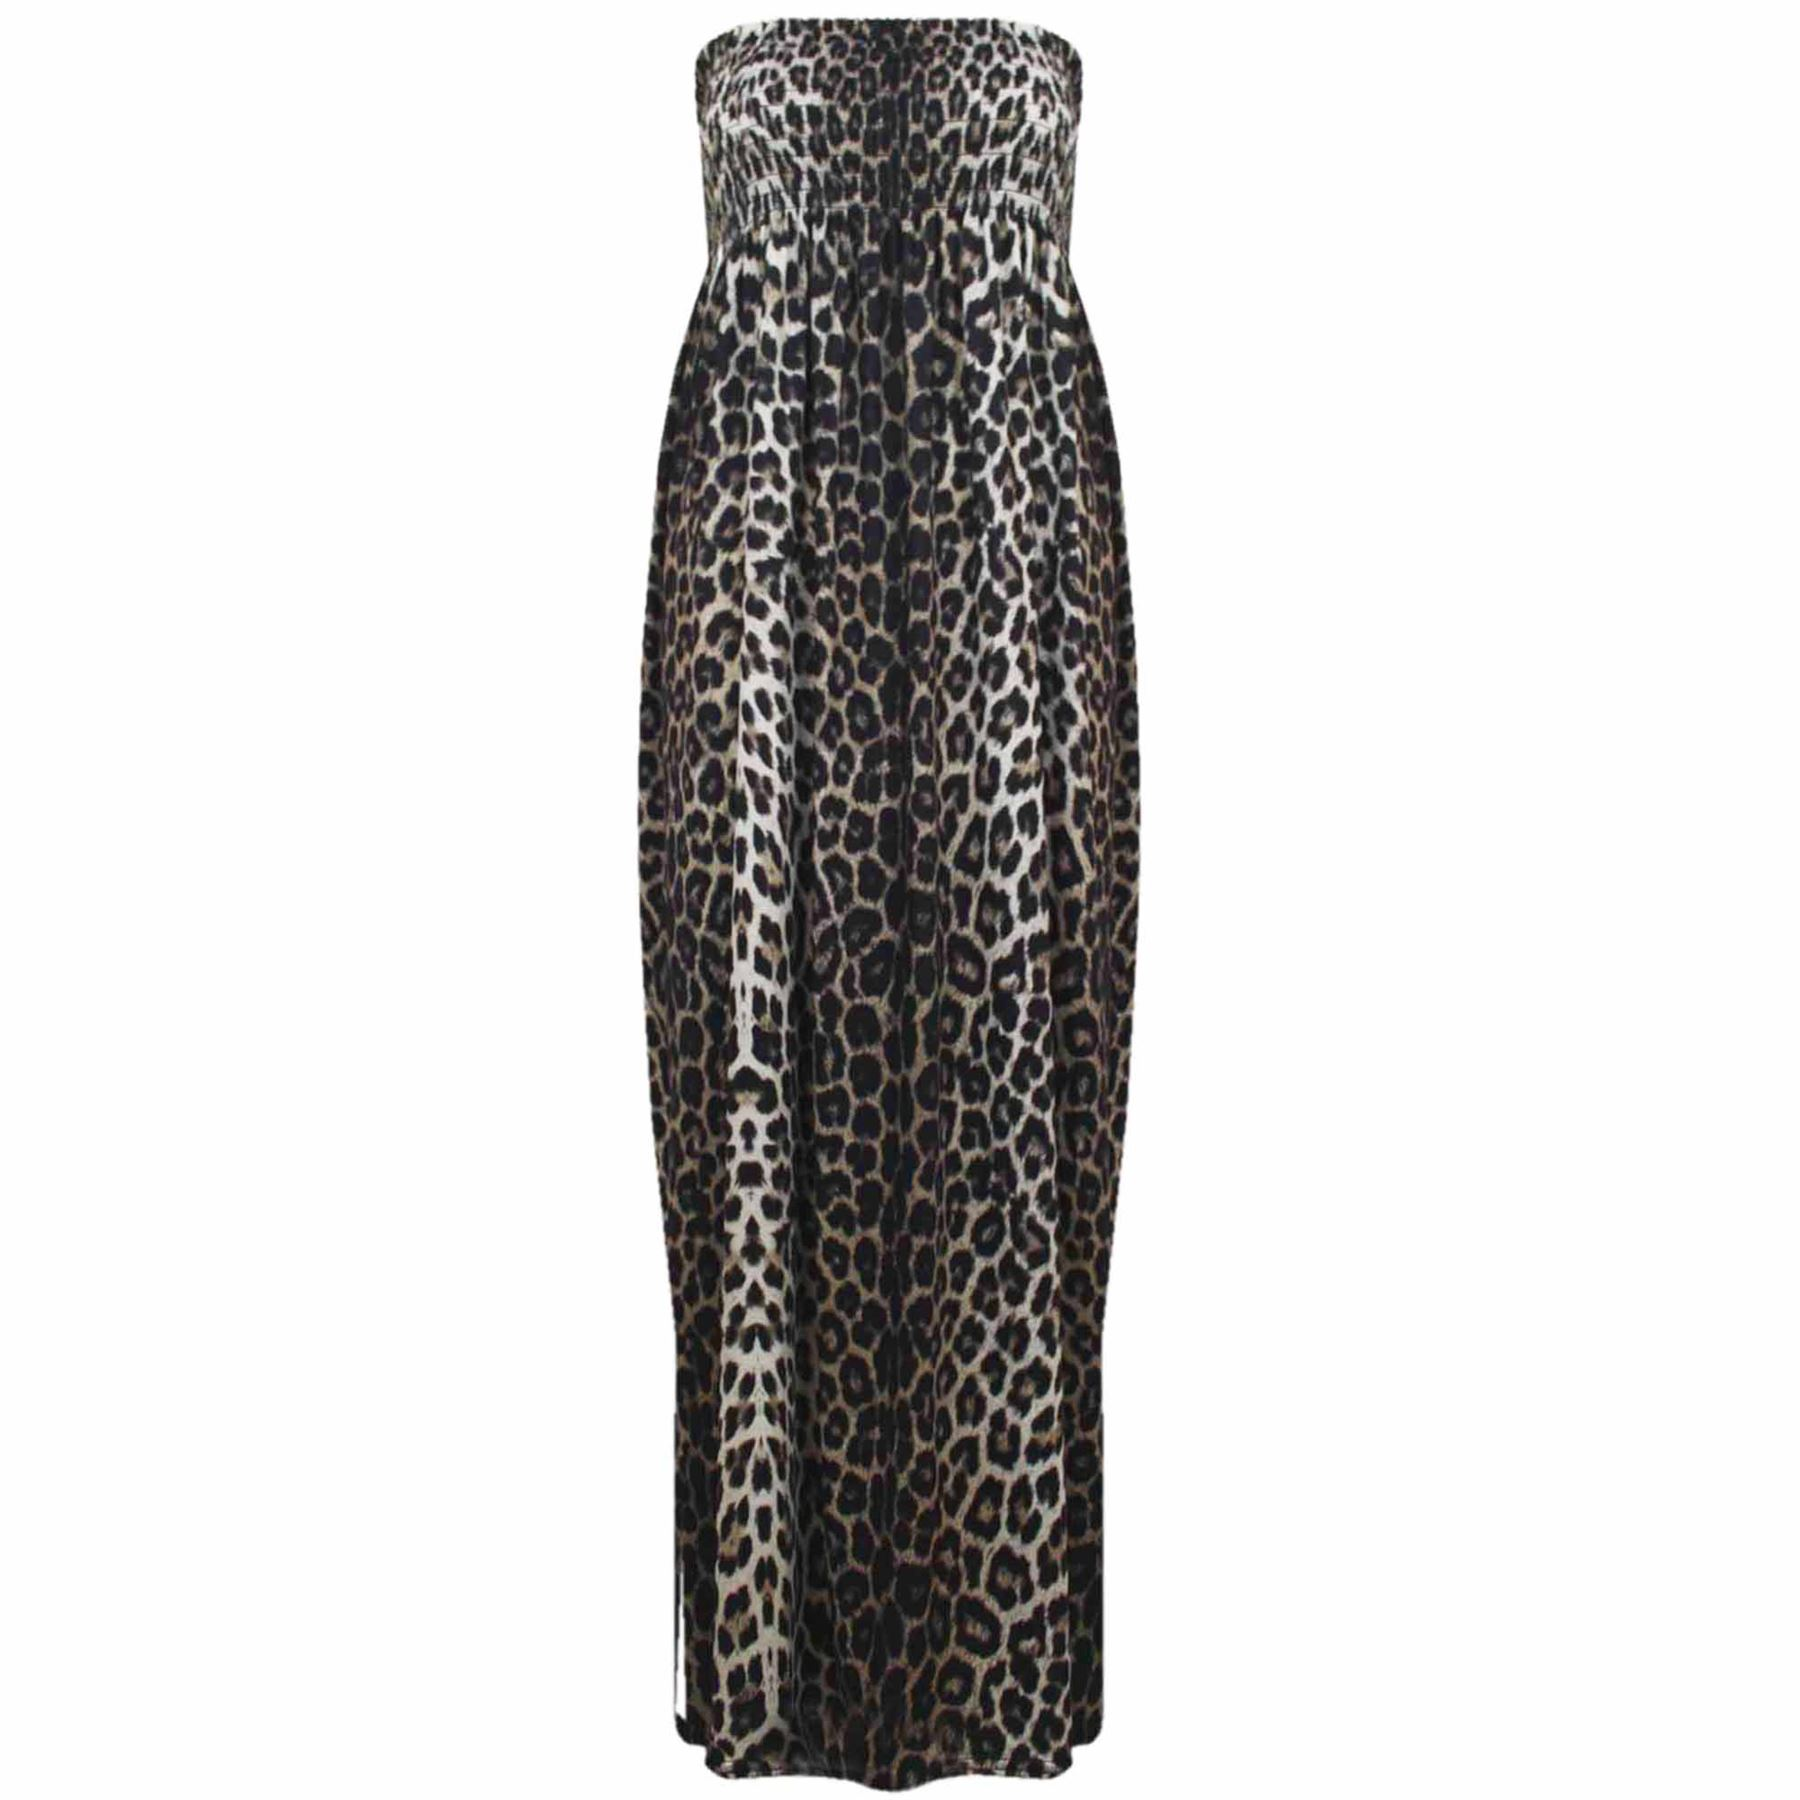 Womens Tie Knot Sleeveless Bandeau Ladies Boobtube Leopard Print Maxi Dress Top